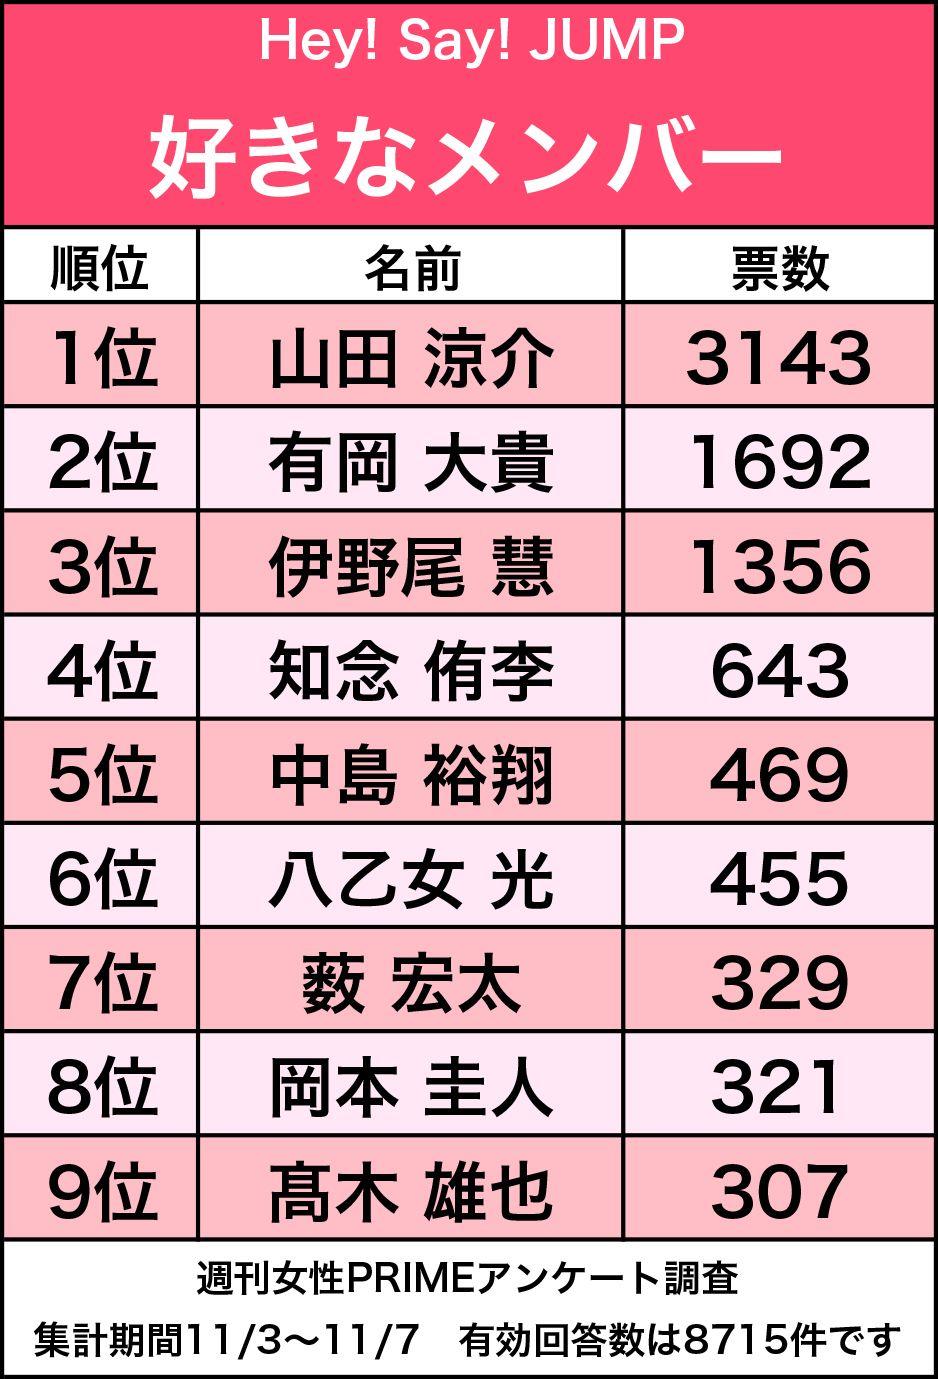 <Hey! Say! JUMP好きなメンバー>ランキングで見えた、山田涼介の ...